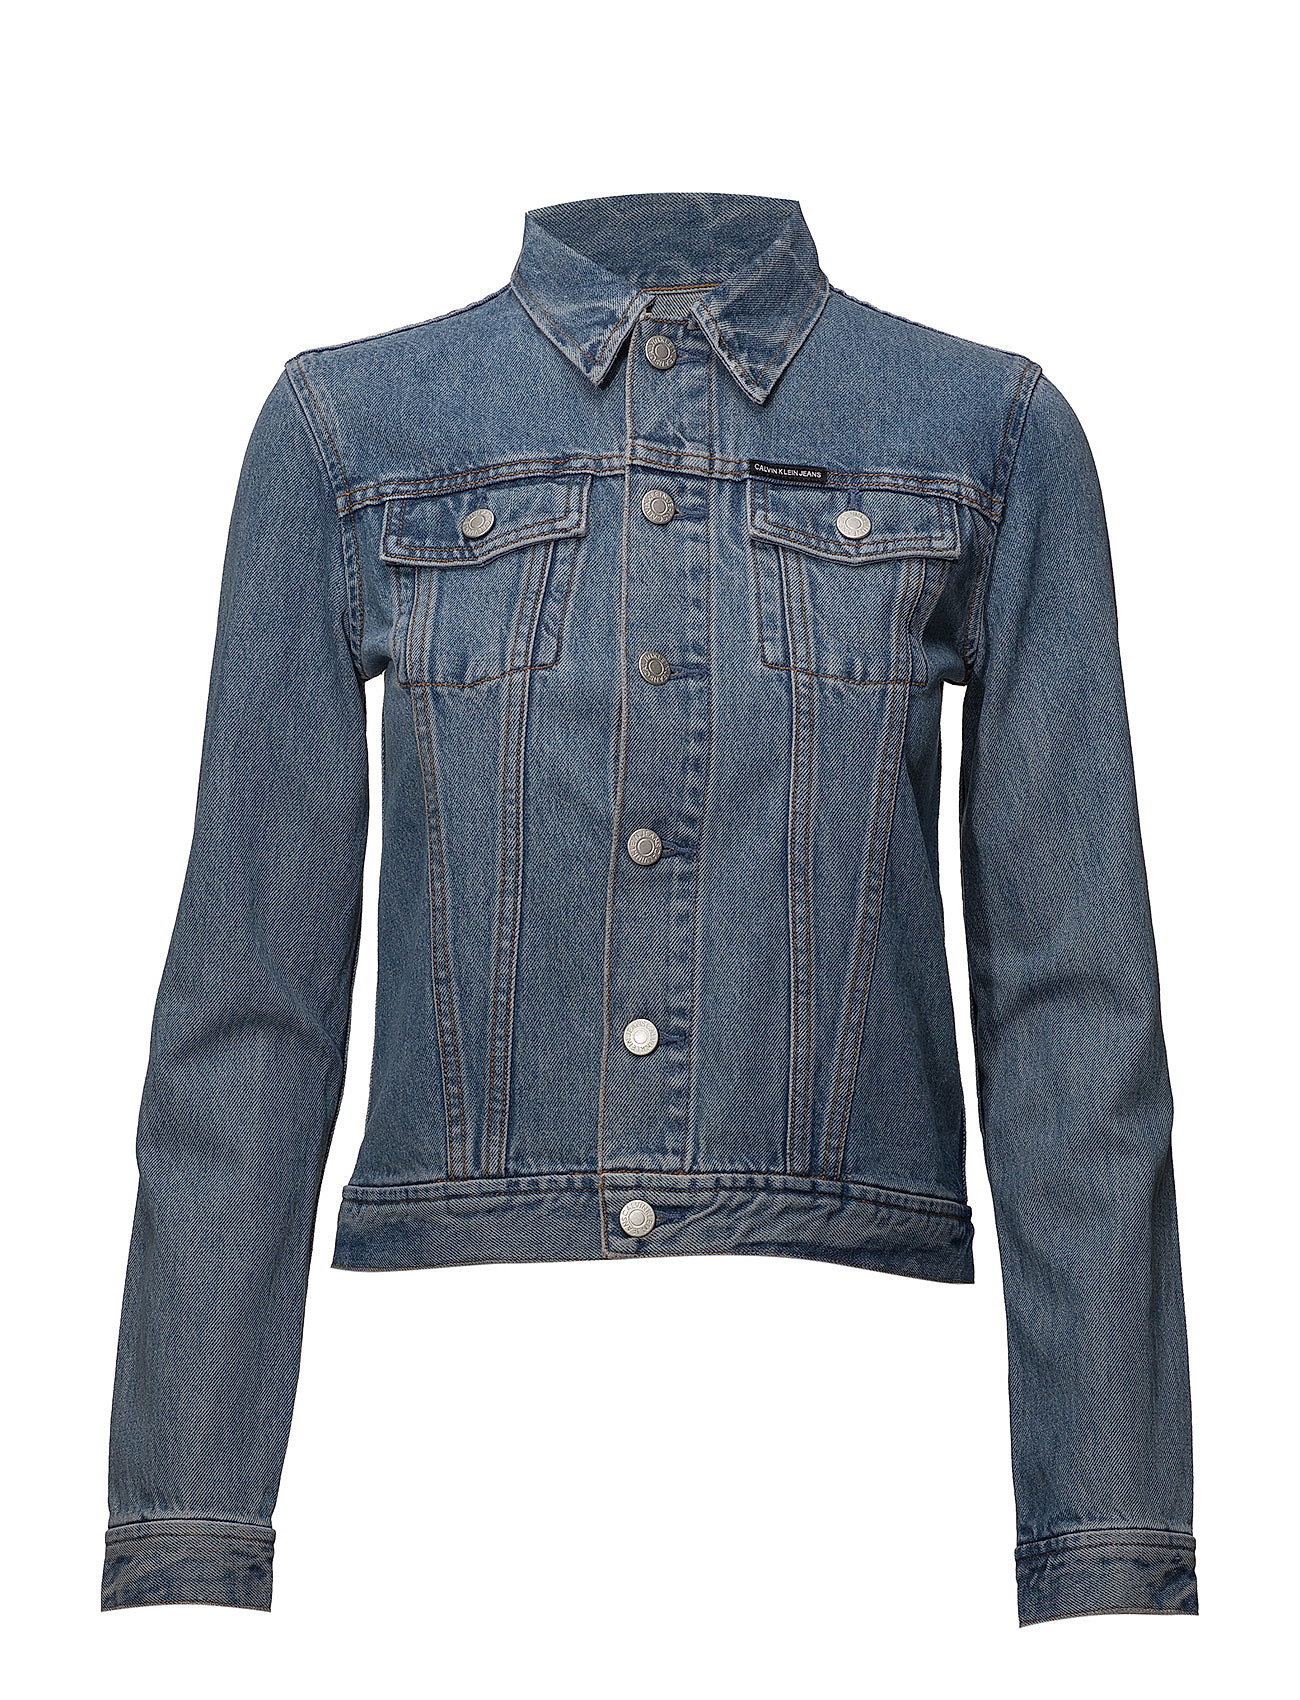 Calvin Klein Jeans Clean line trucker - LYON BLUE WITH PATCH